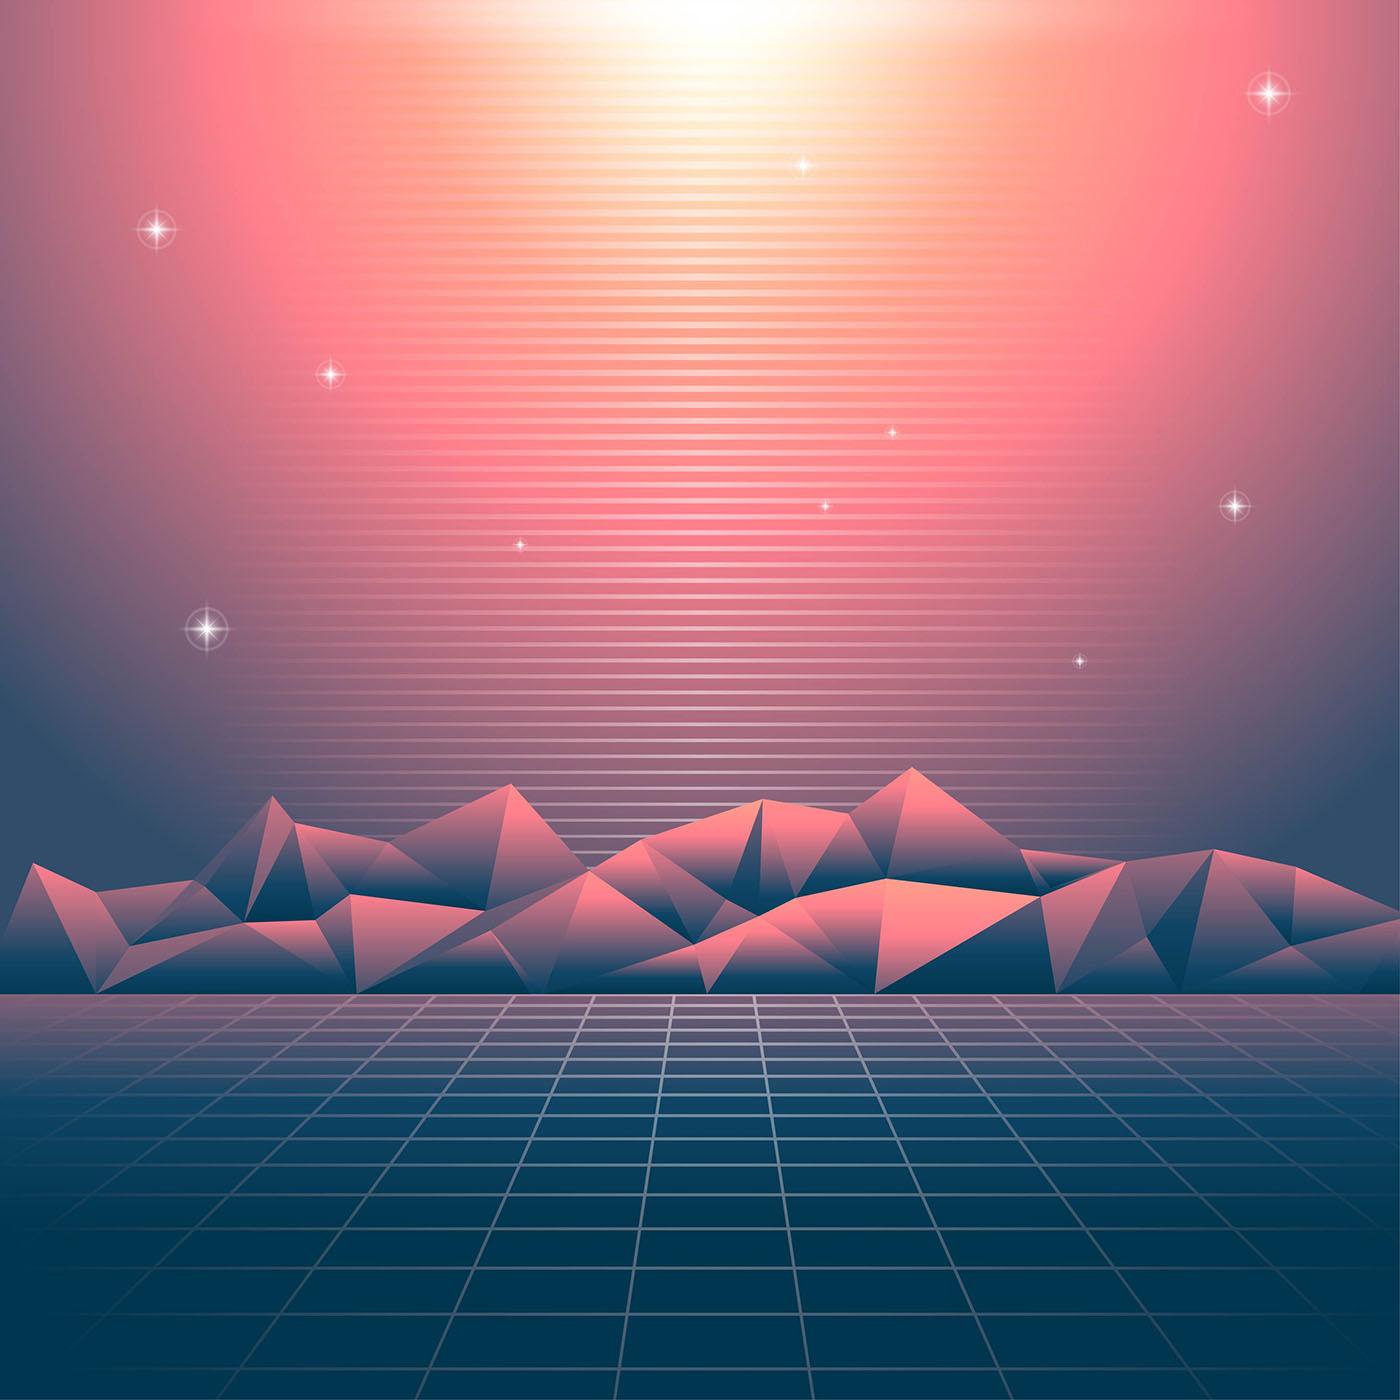 Retro Hintergrund Vaporwave Lights 21 Vektor Kunst bei Vecteezy